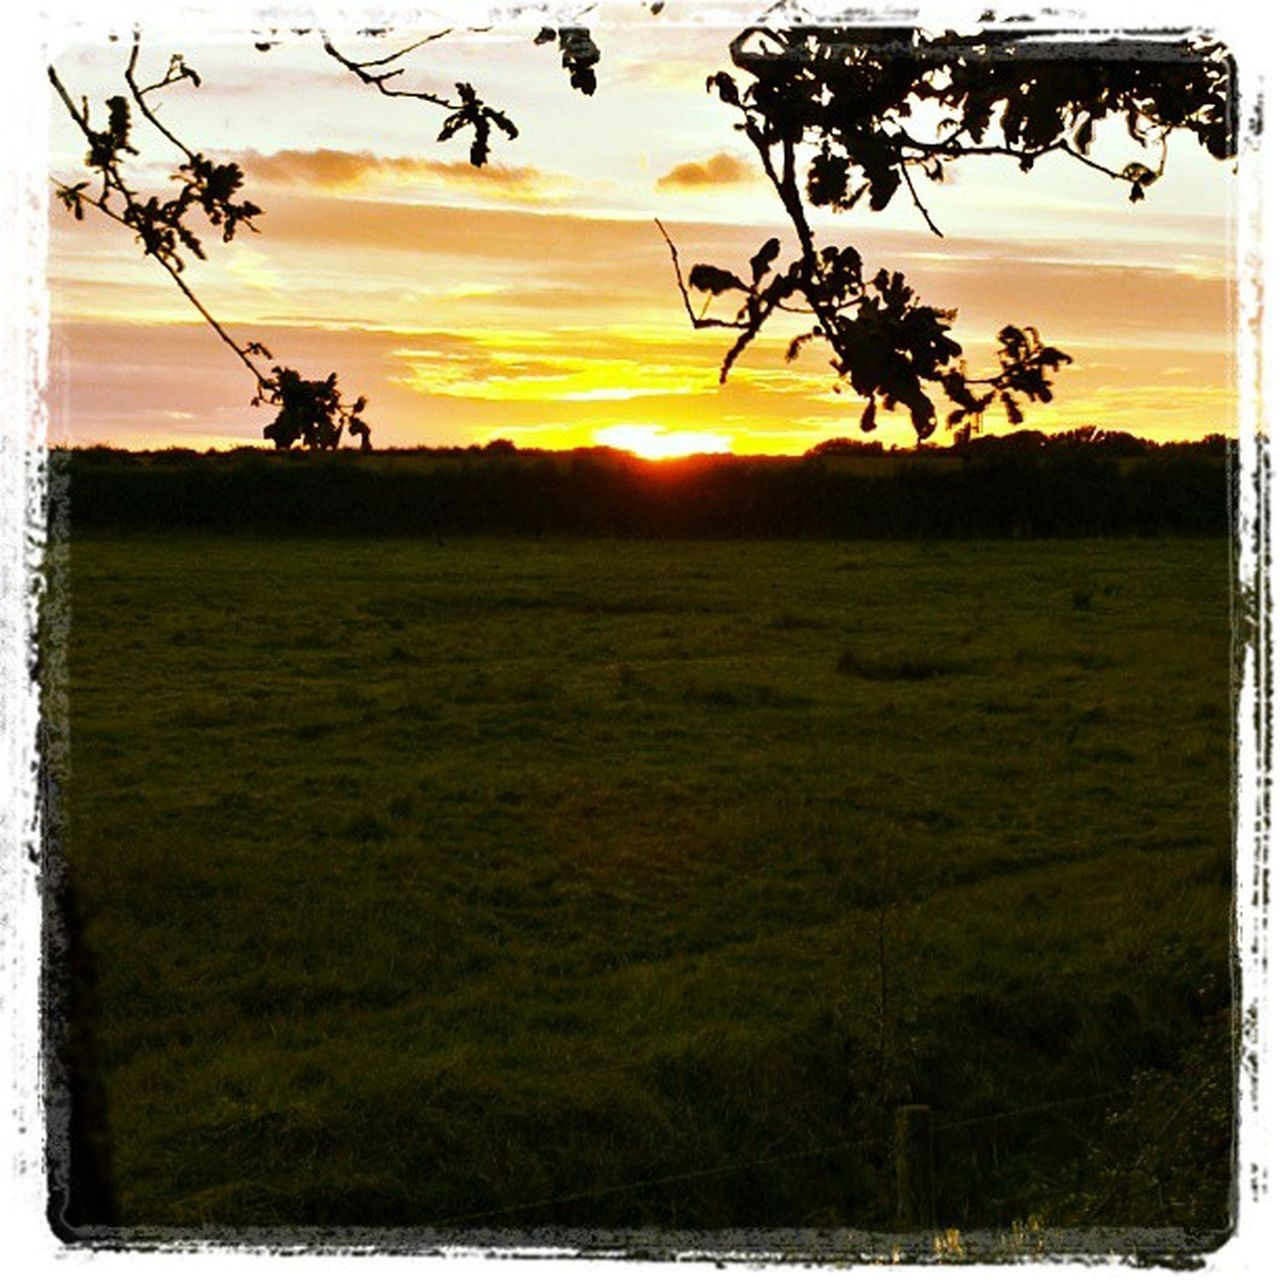 Sunset Evening Gettingcold Endofsummer